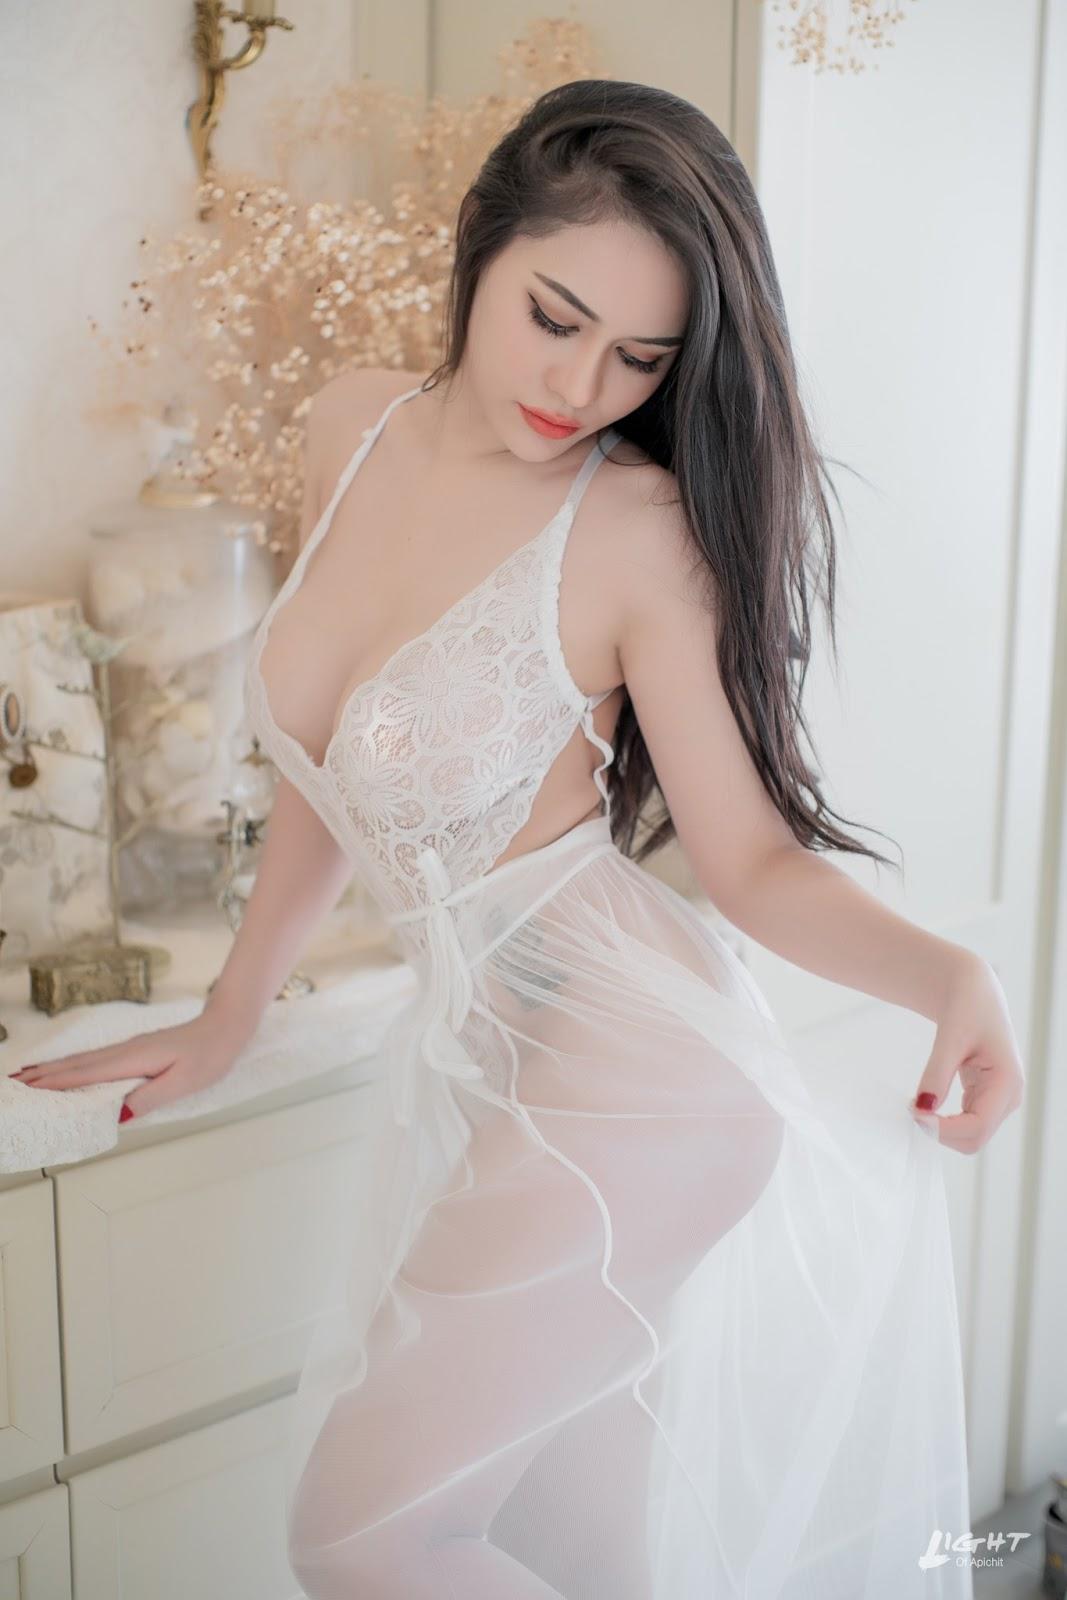 Thailand Beautyful Girl Pic No.532    Alisa Zhara